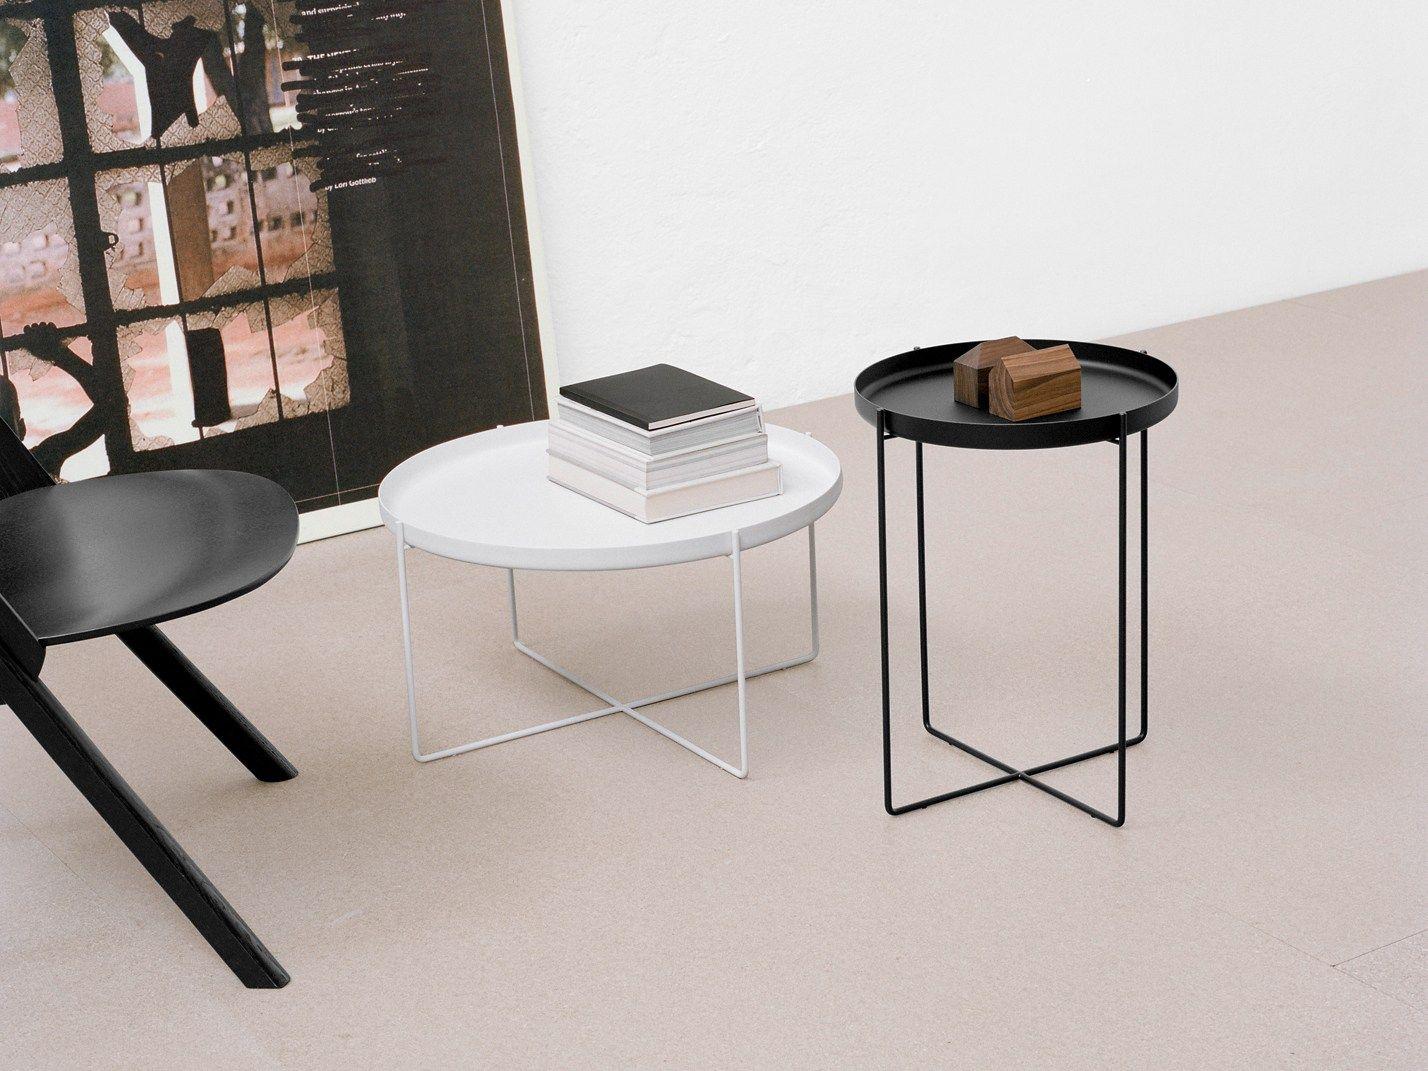 Tavolino Vassoio ~ Tavolino basso modulare rettangolare in betulla one by lllooch